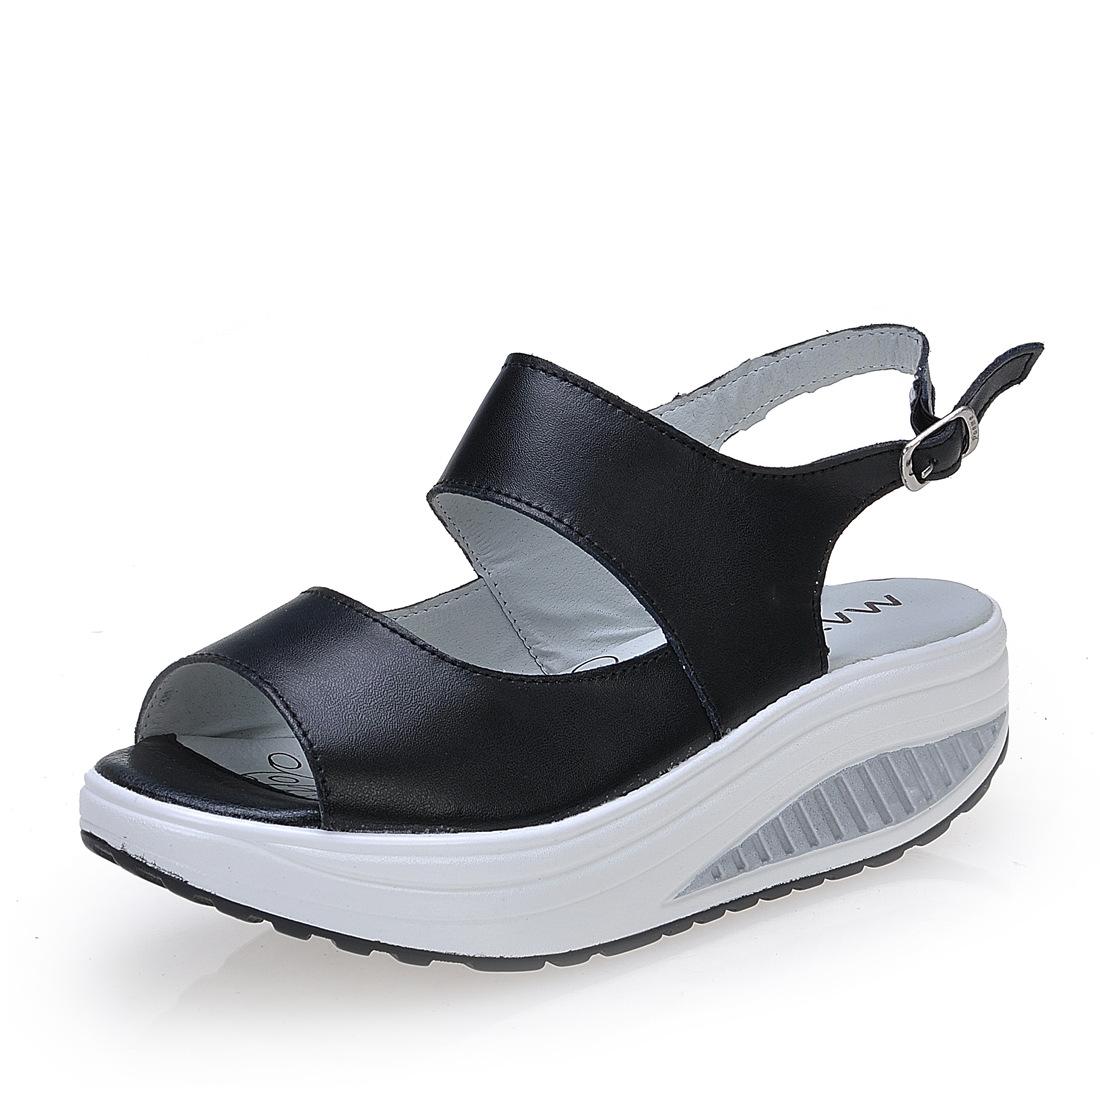 Leather Buckle Wedge Sandals Comfortable Shake Peep Toe Platform Sandals